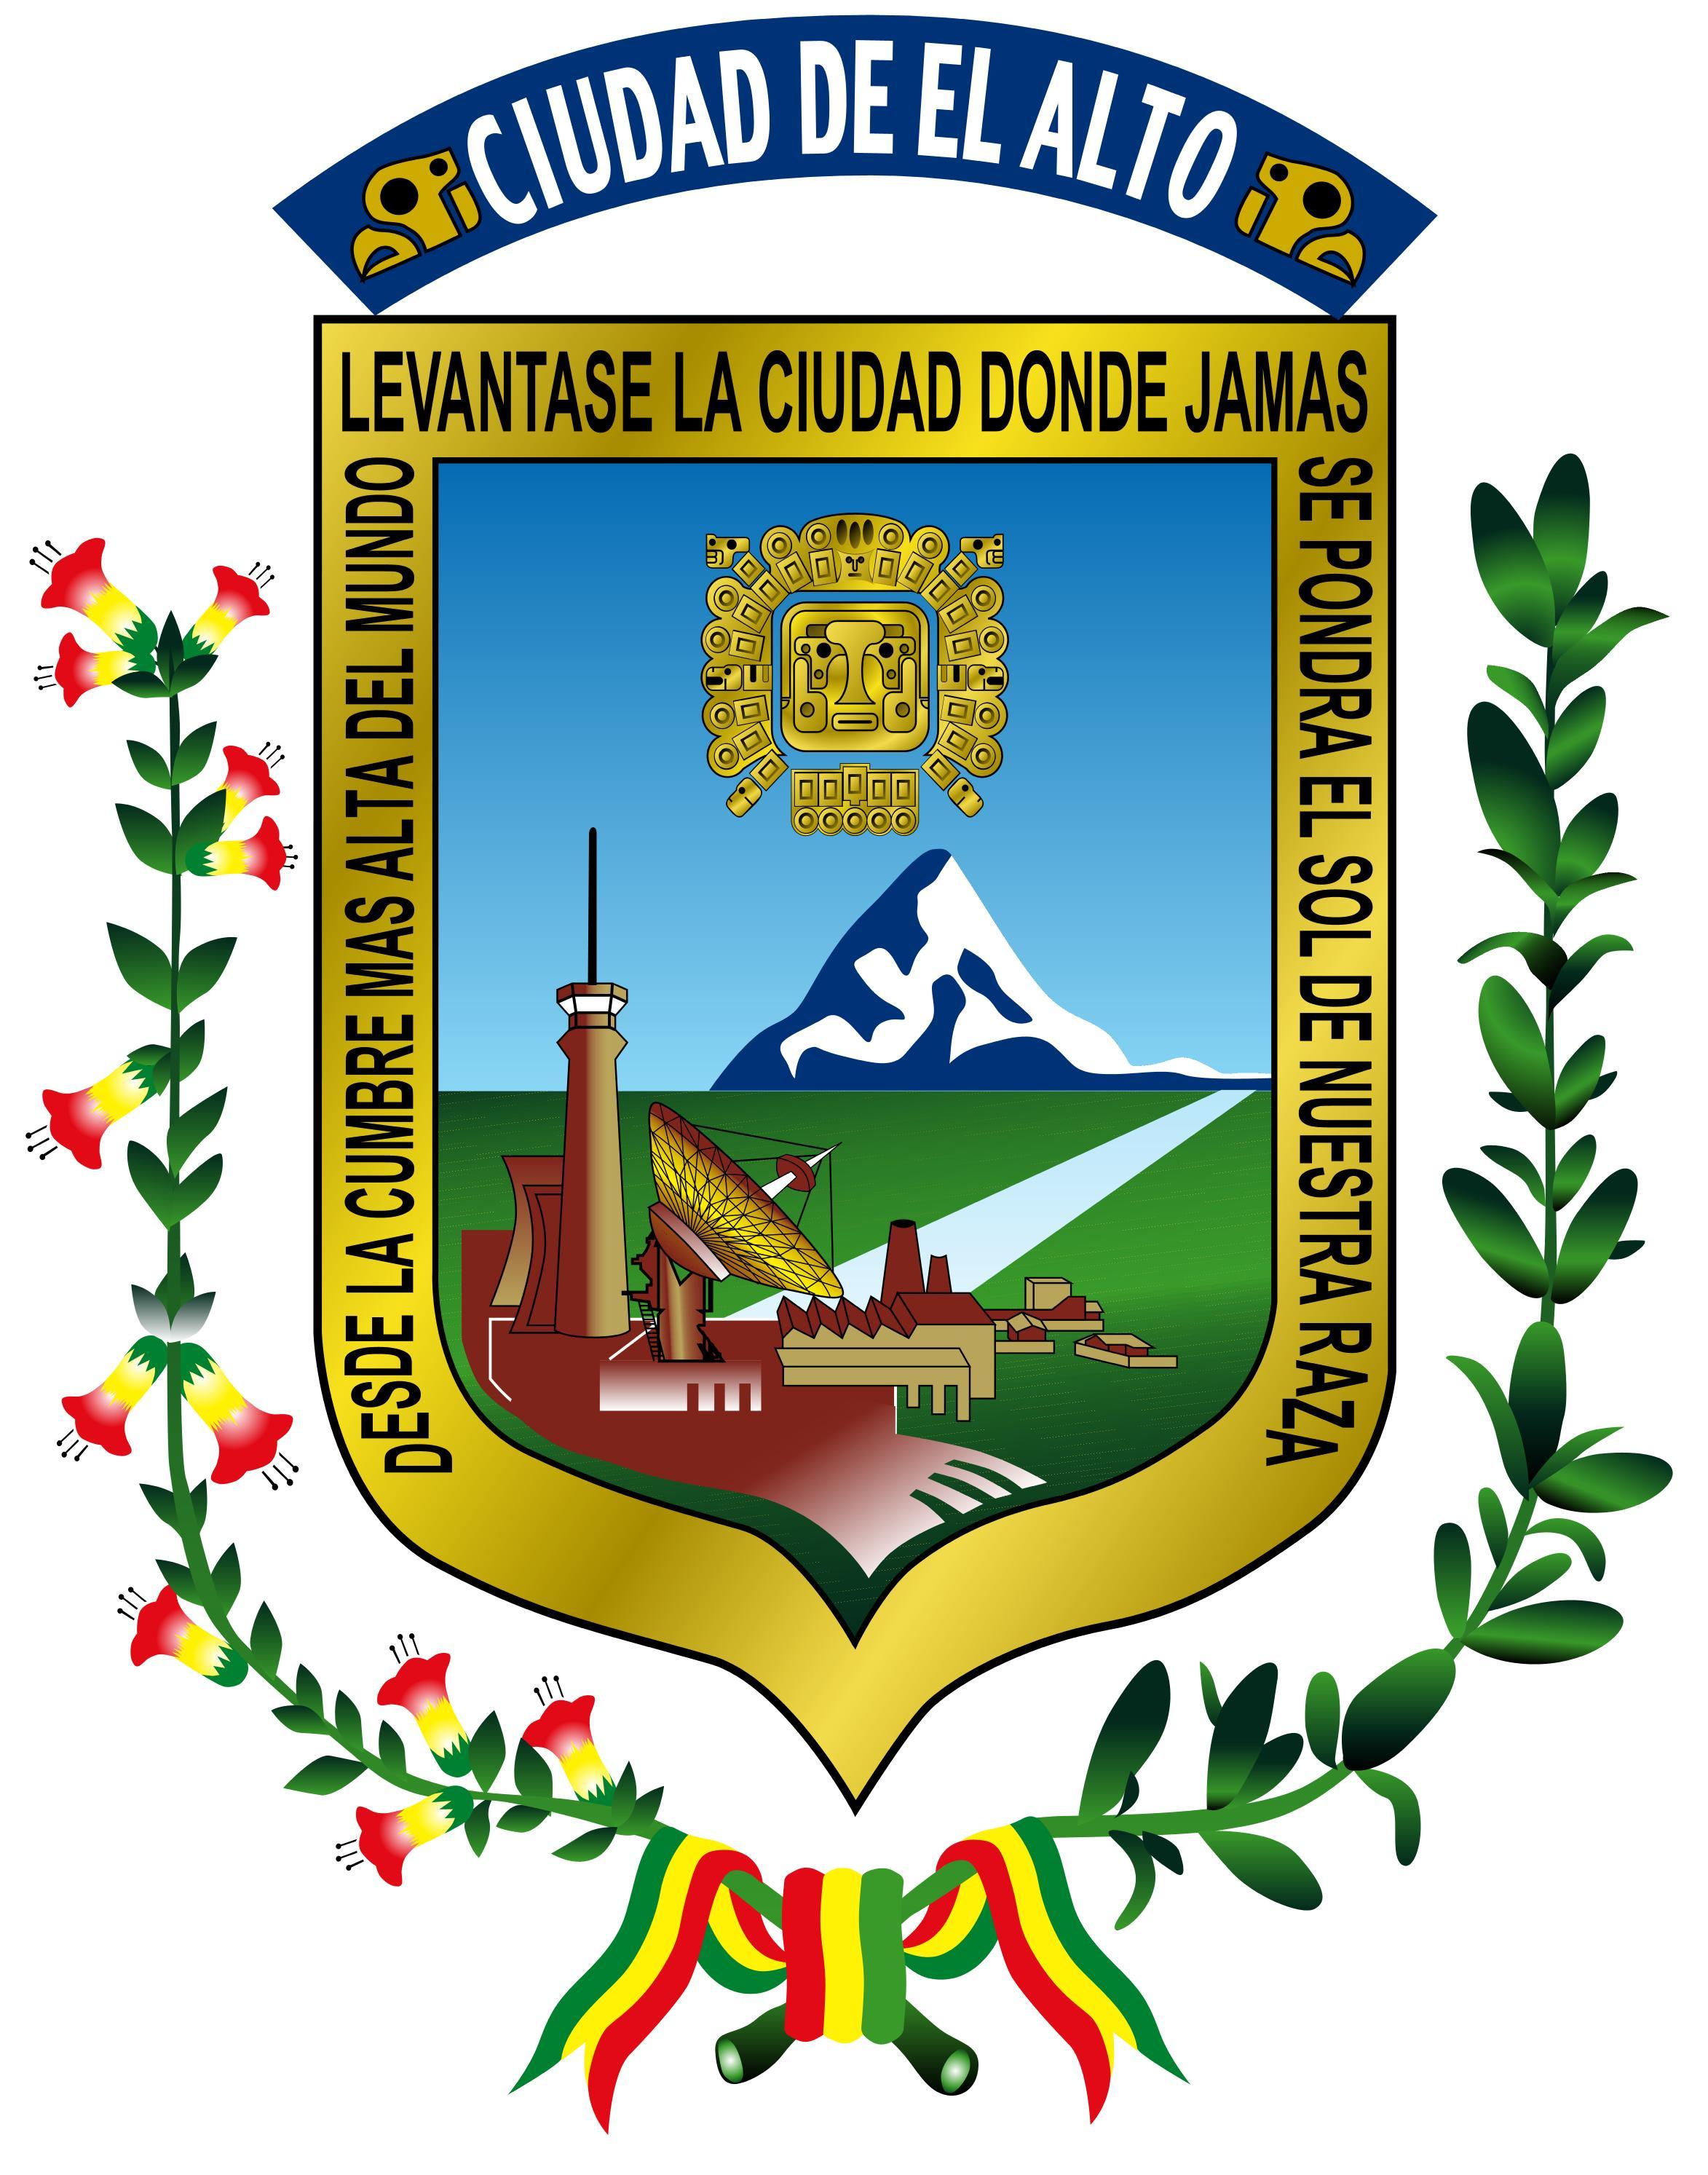 El Gran Combo de Puerto Rico - Wikipedia, the free